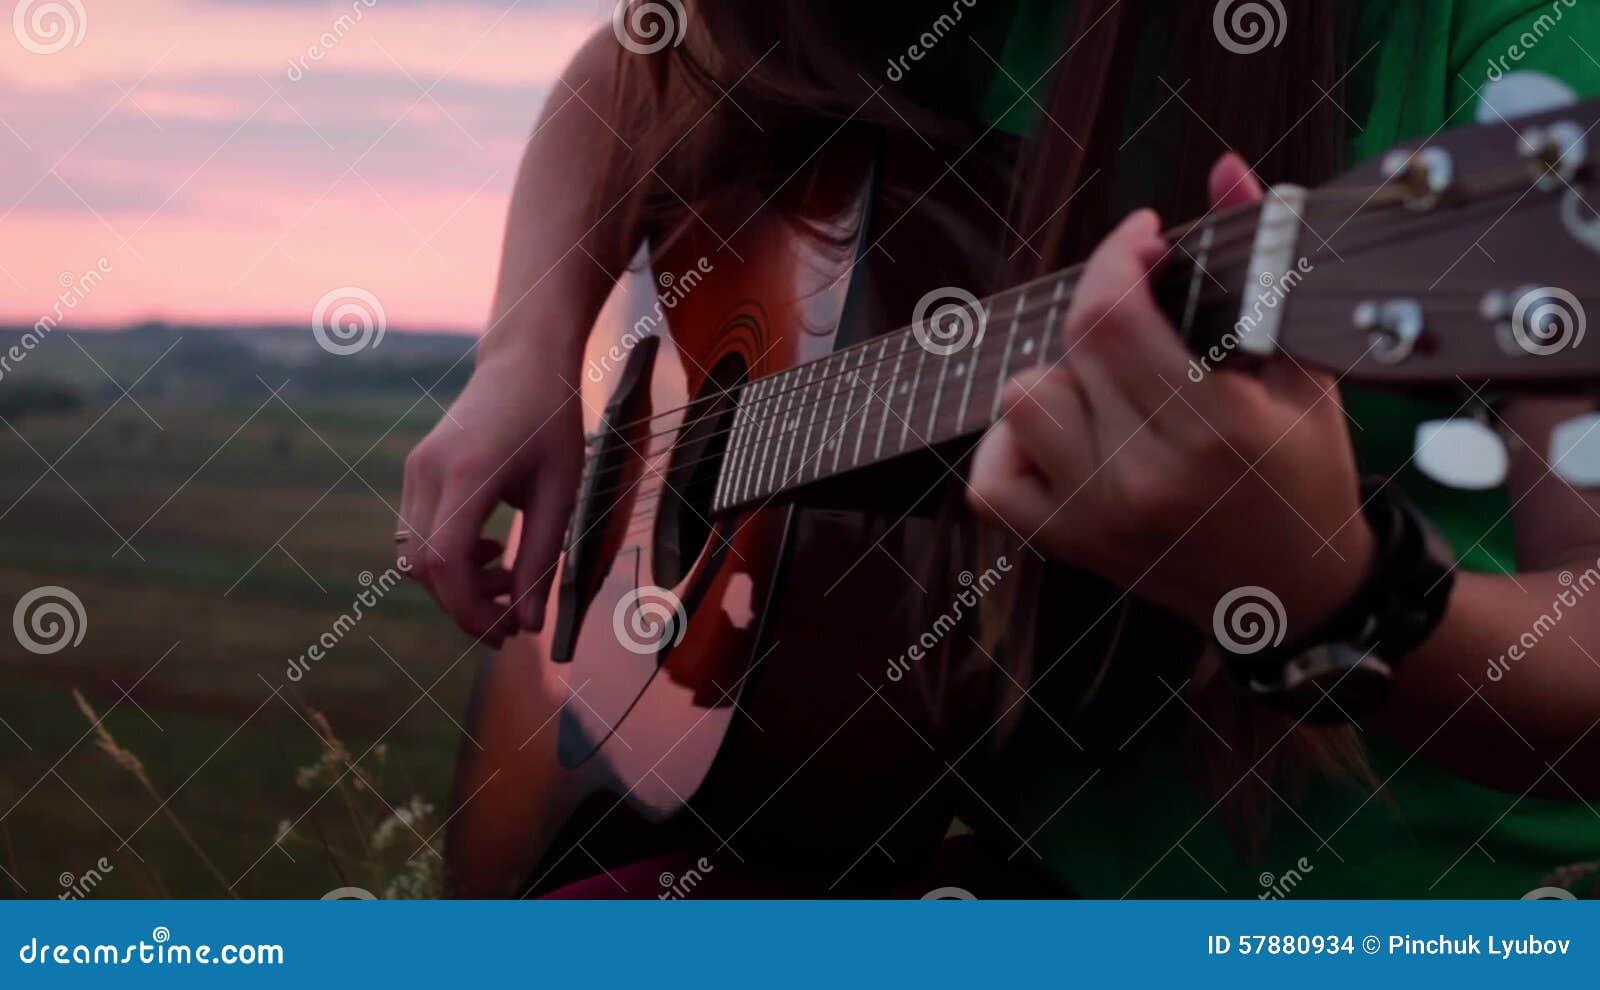 Girl Playing Guitar At Sunset Video Footage 57880934 Megapixl